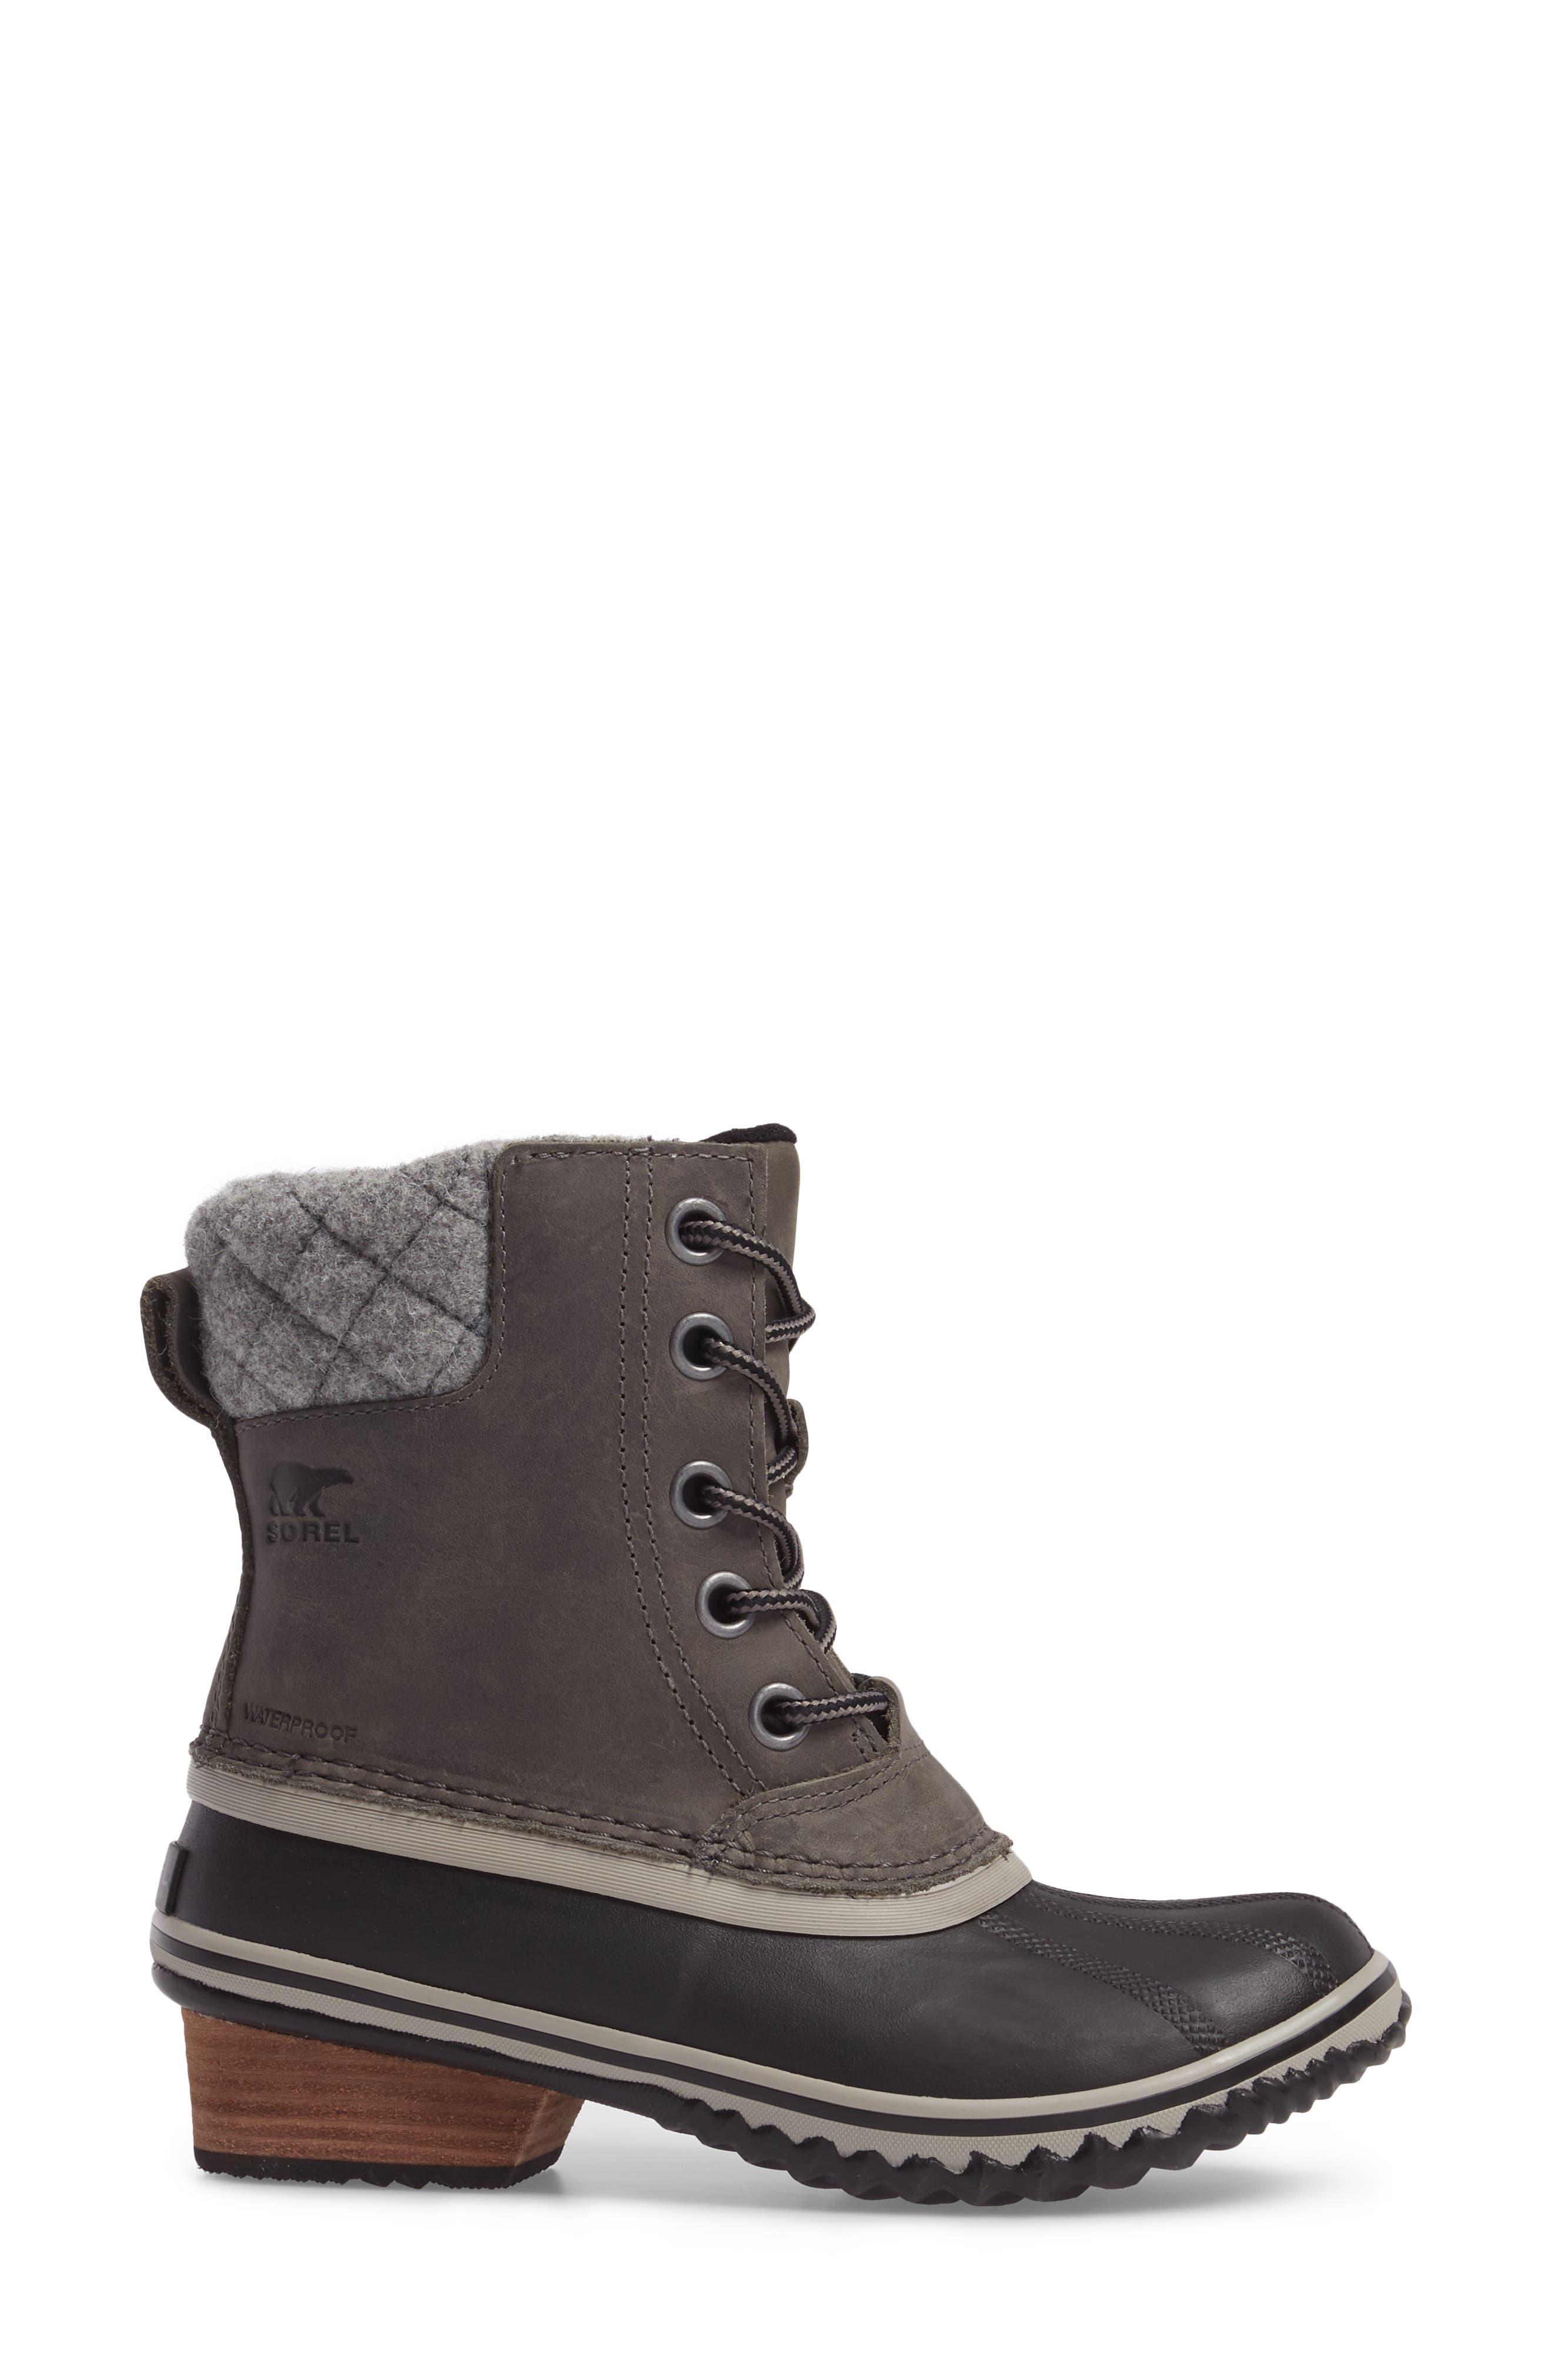 Slimpack II Waterproof Boot,                             Alternate thumbnail 3, color,                             Quarry/ Black